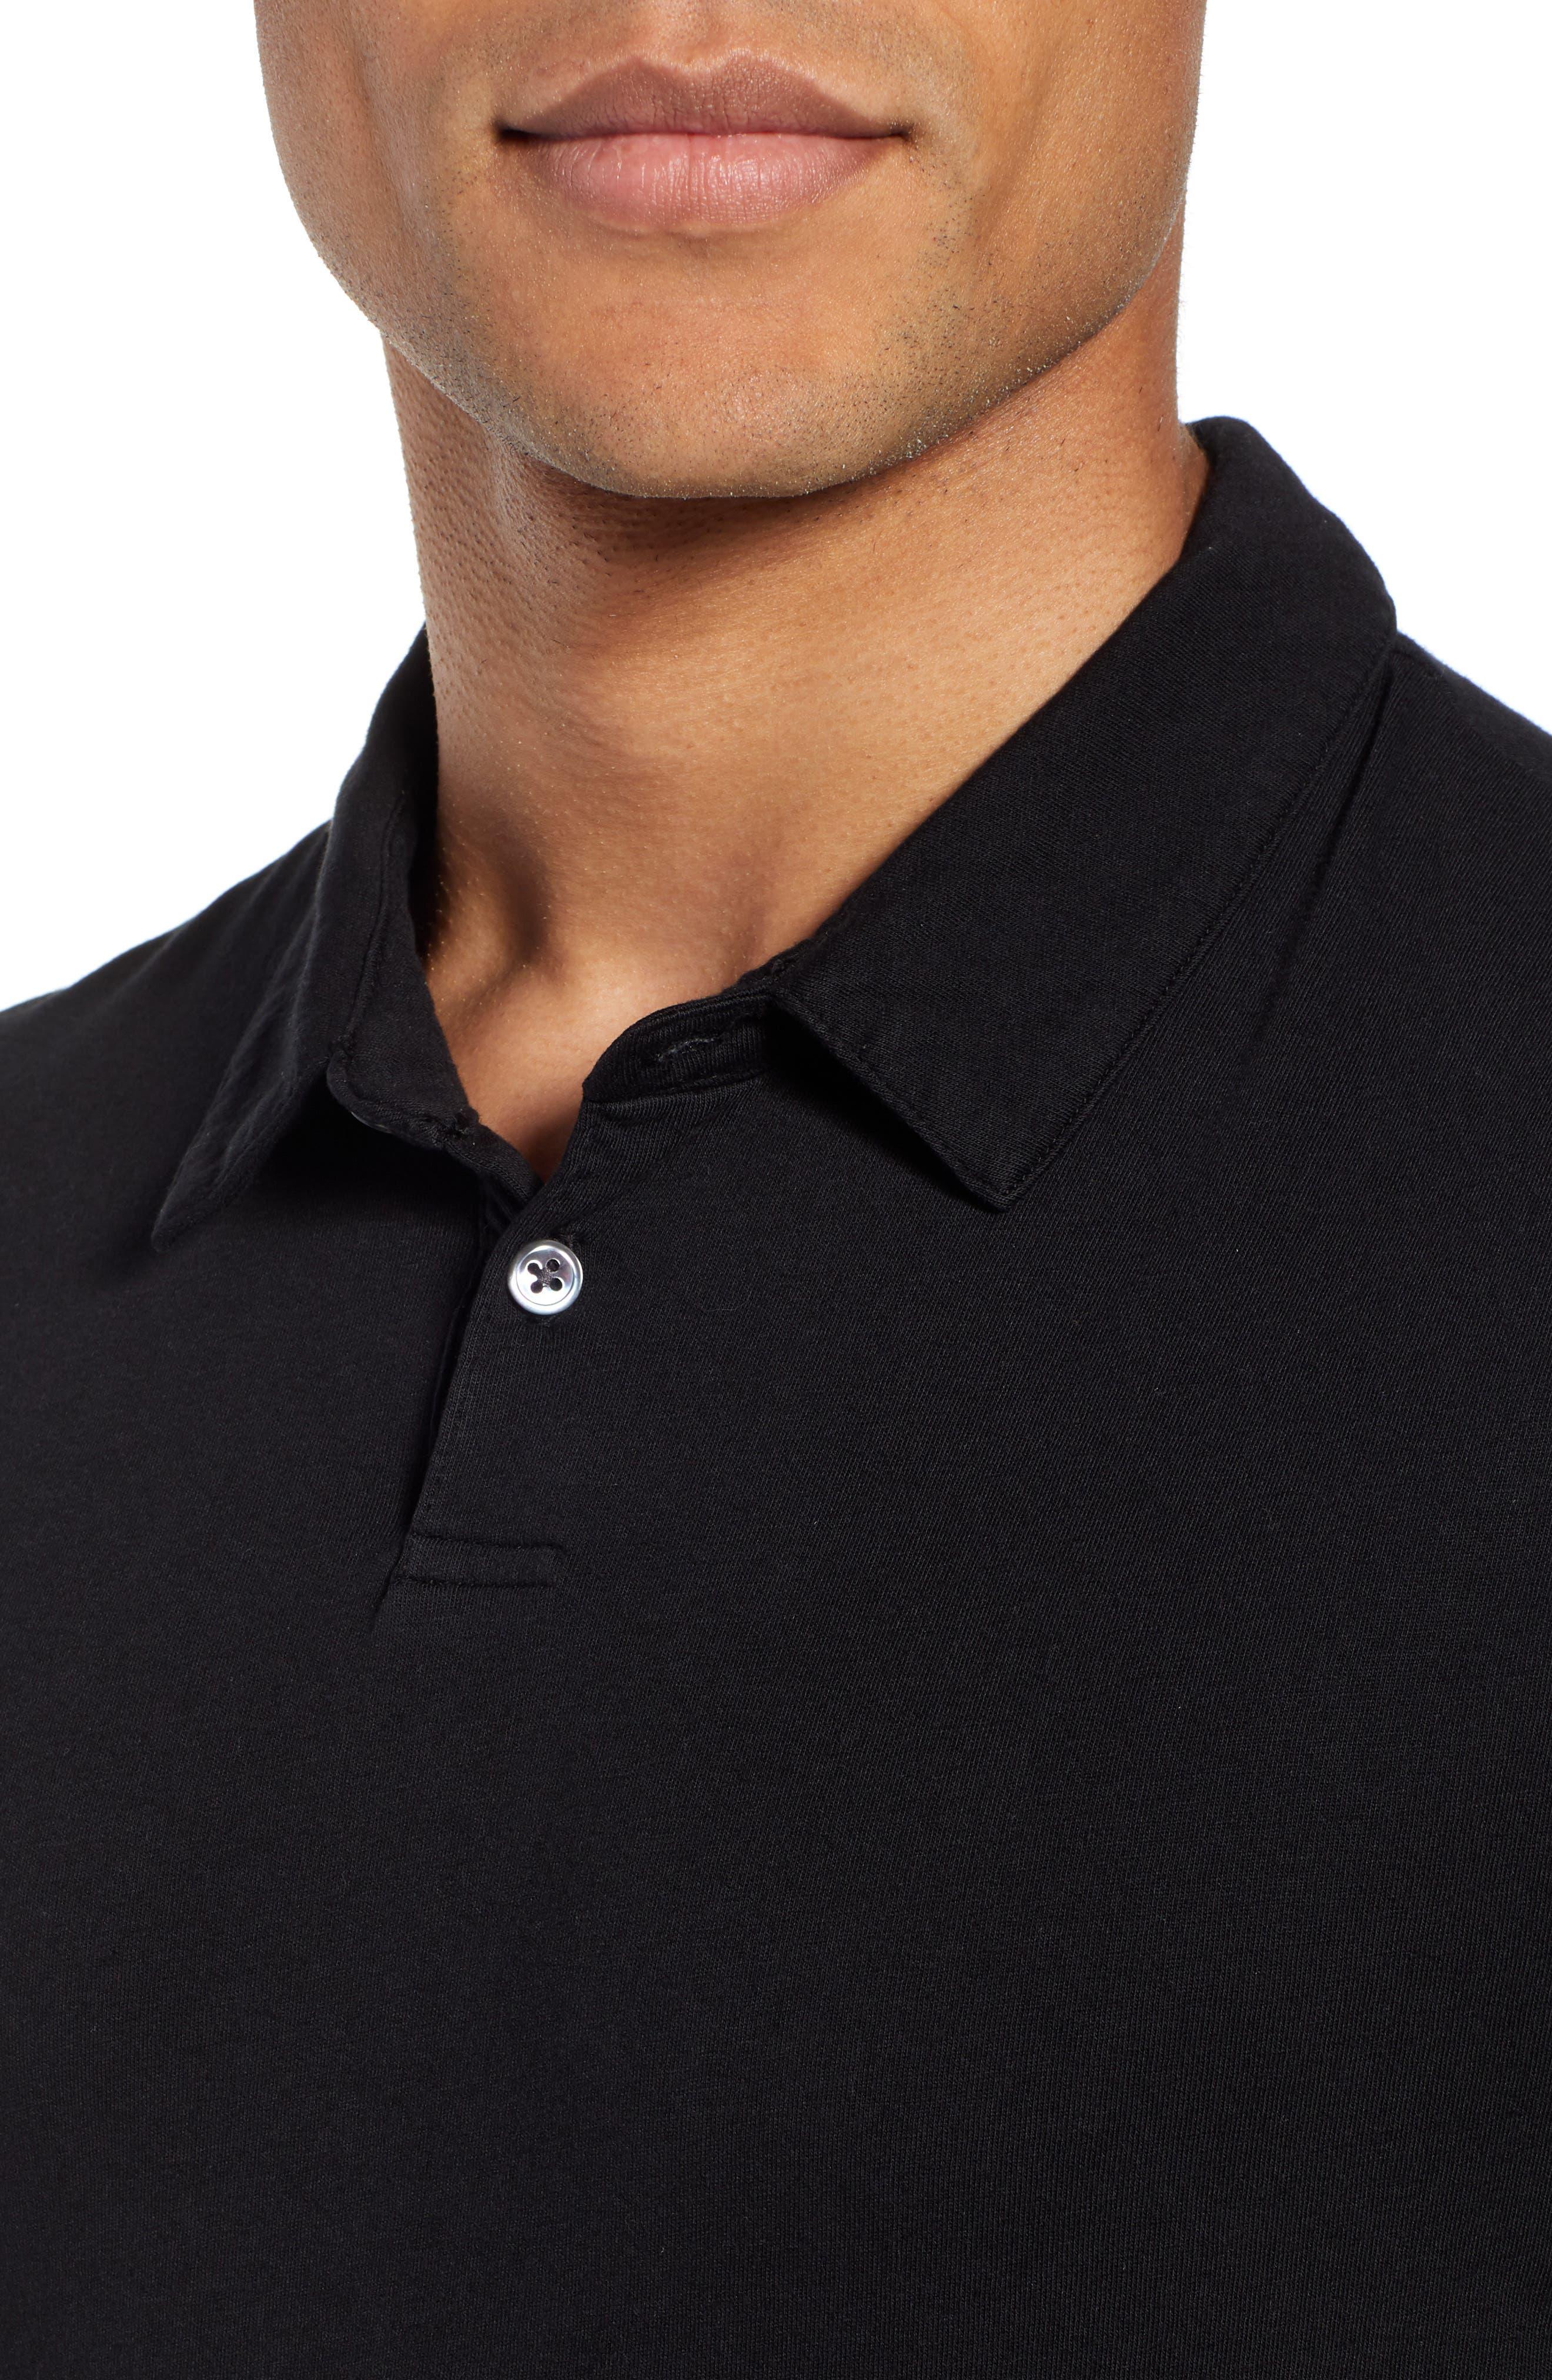 Regular Fit Jersey Polo,                             Alternate thumbnail 4, color,                             BLACK